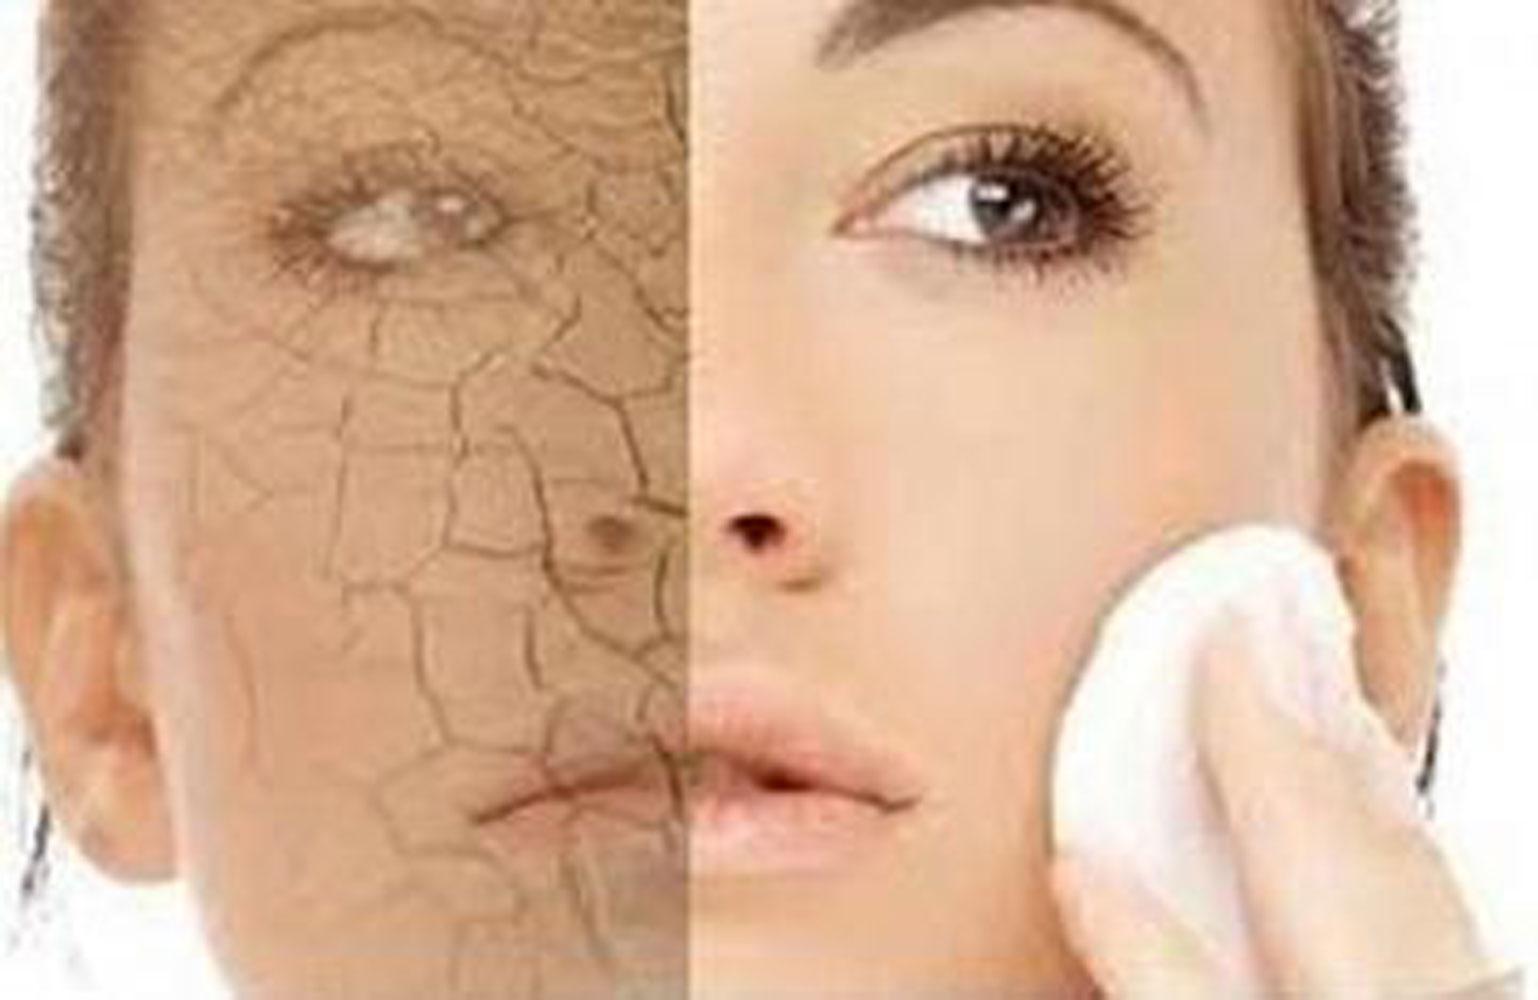 DRY-SKIN-2 Dry Skin / Xerosis